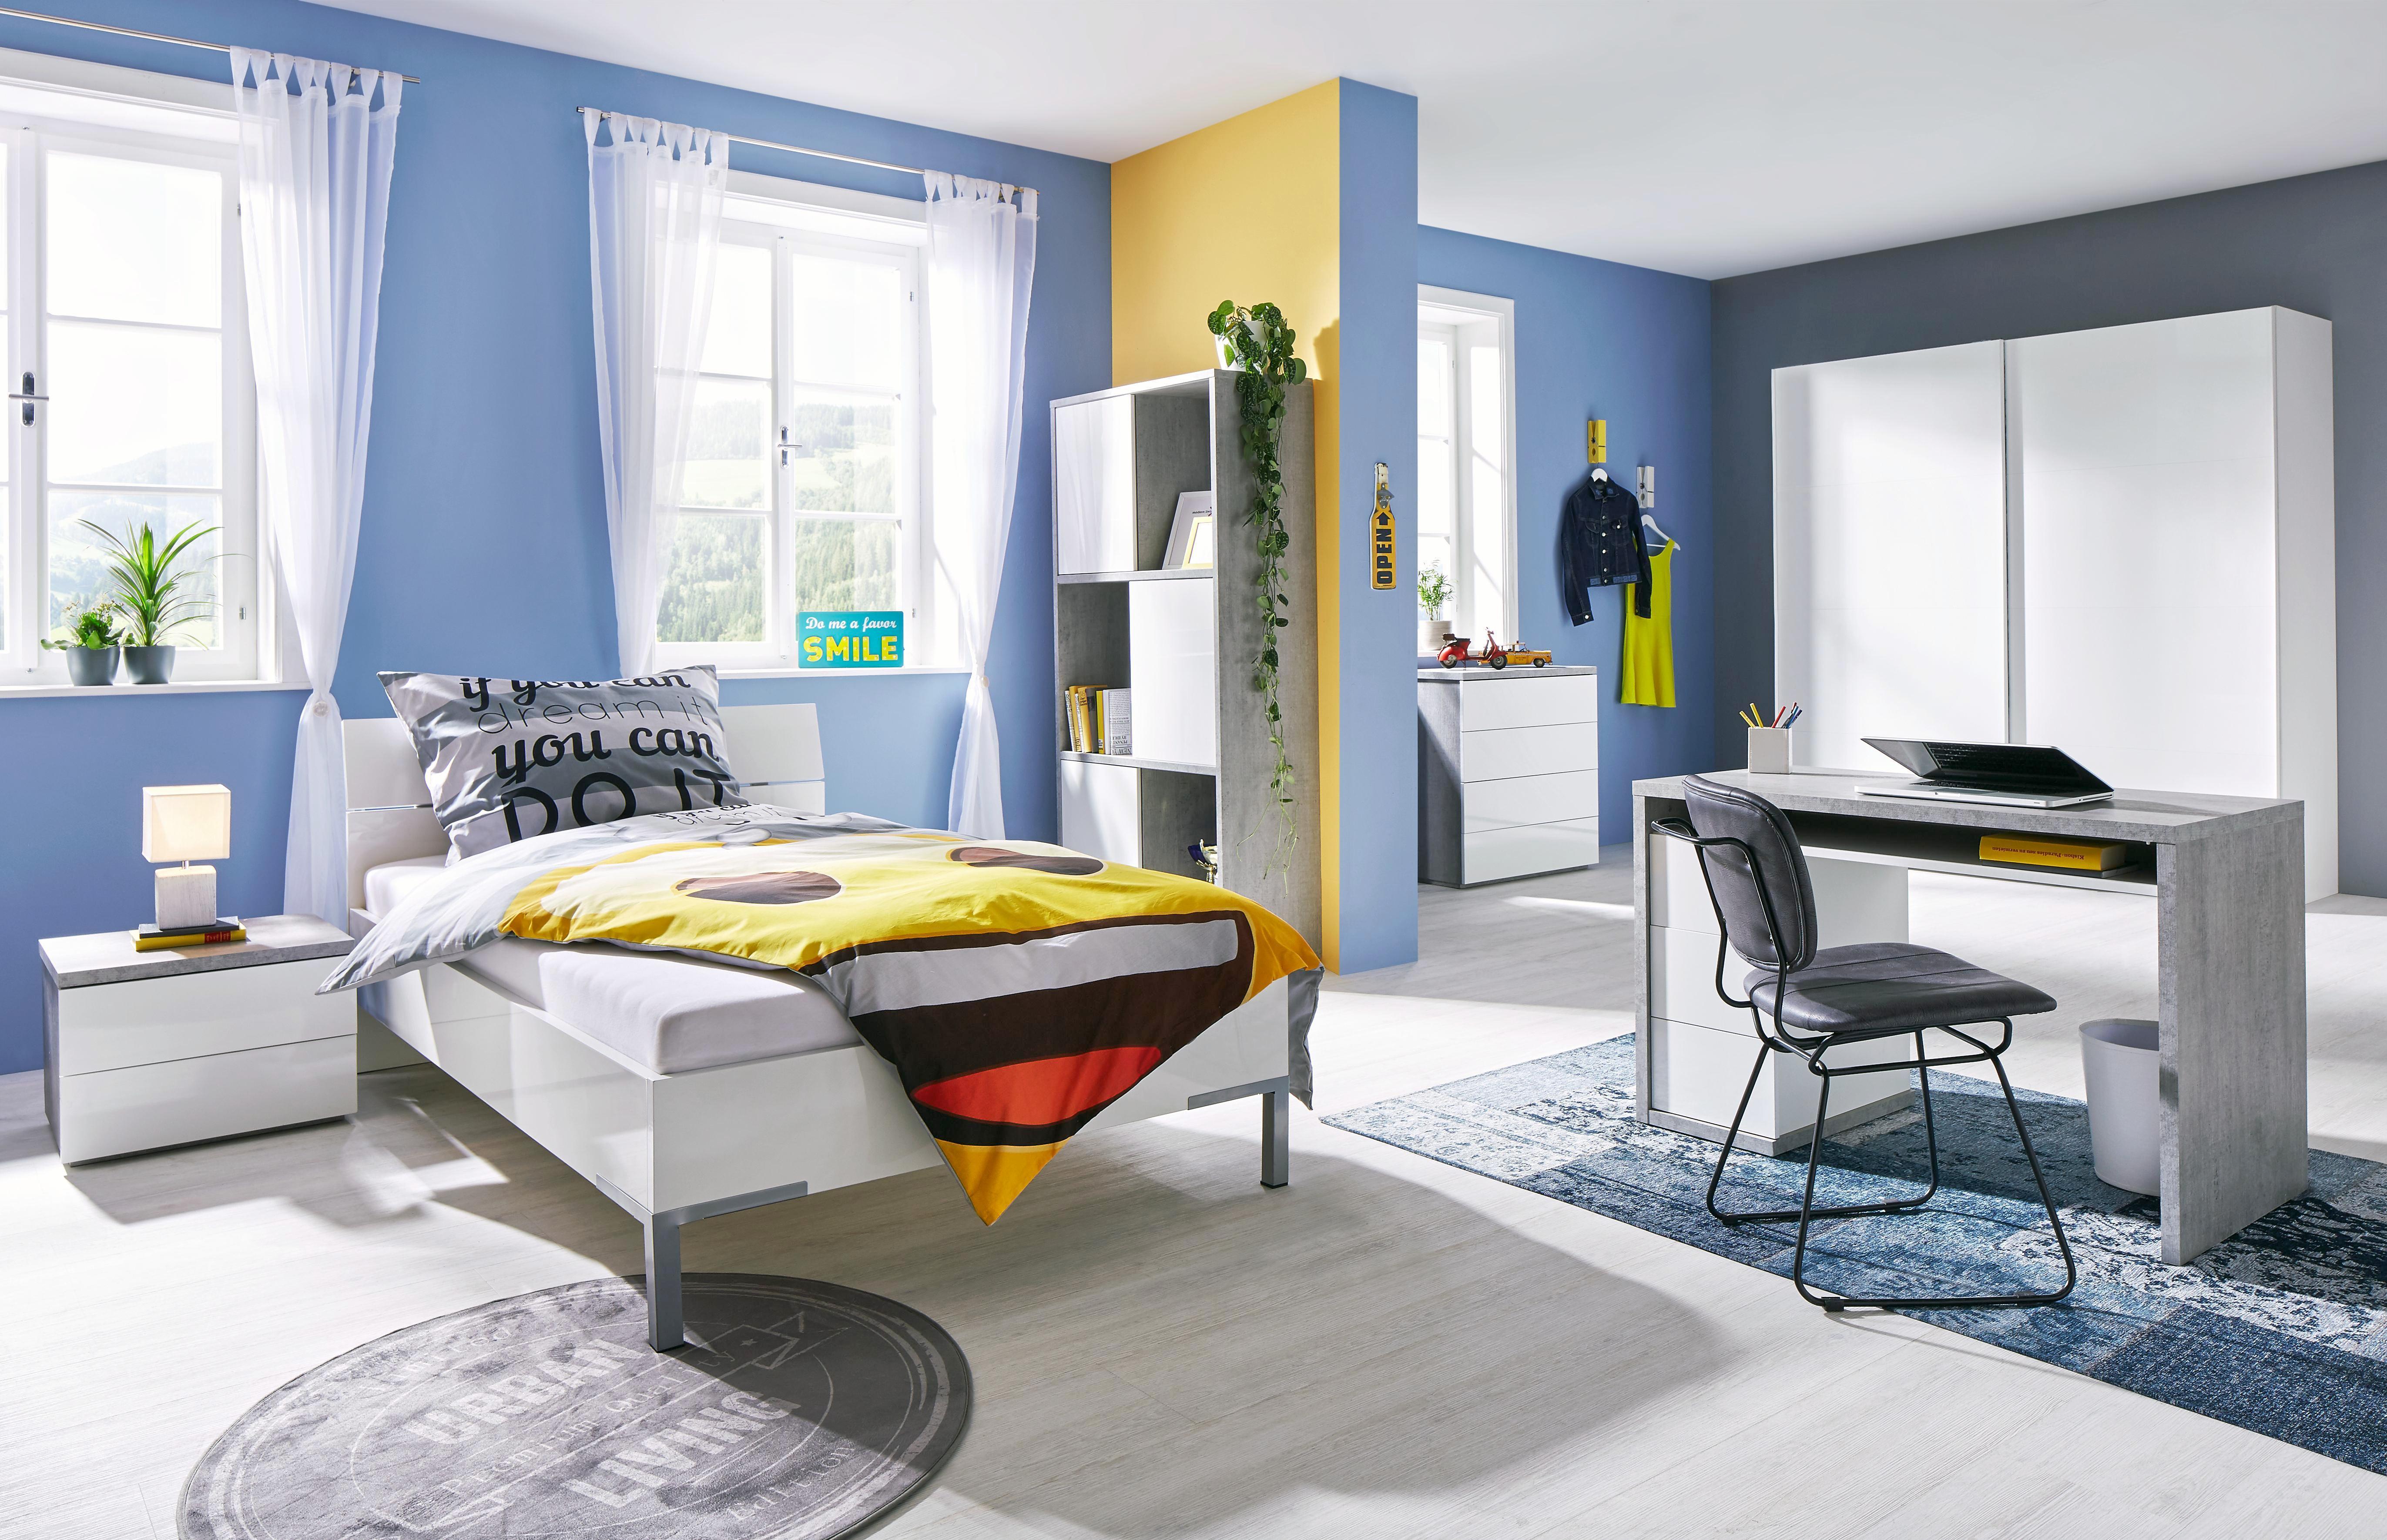 Kinder-/Juniorbett in Weiß ca. 120x200cm - (126/87/212cm) - MODERN LIVING